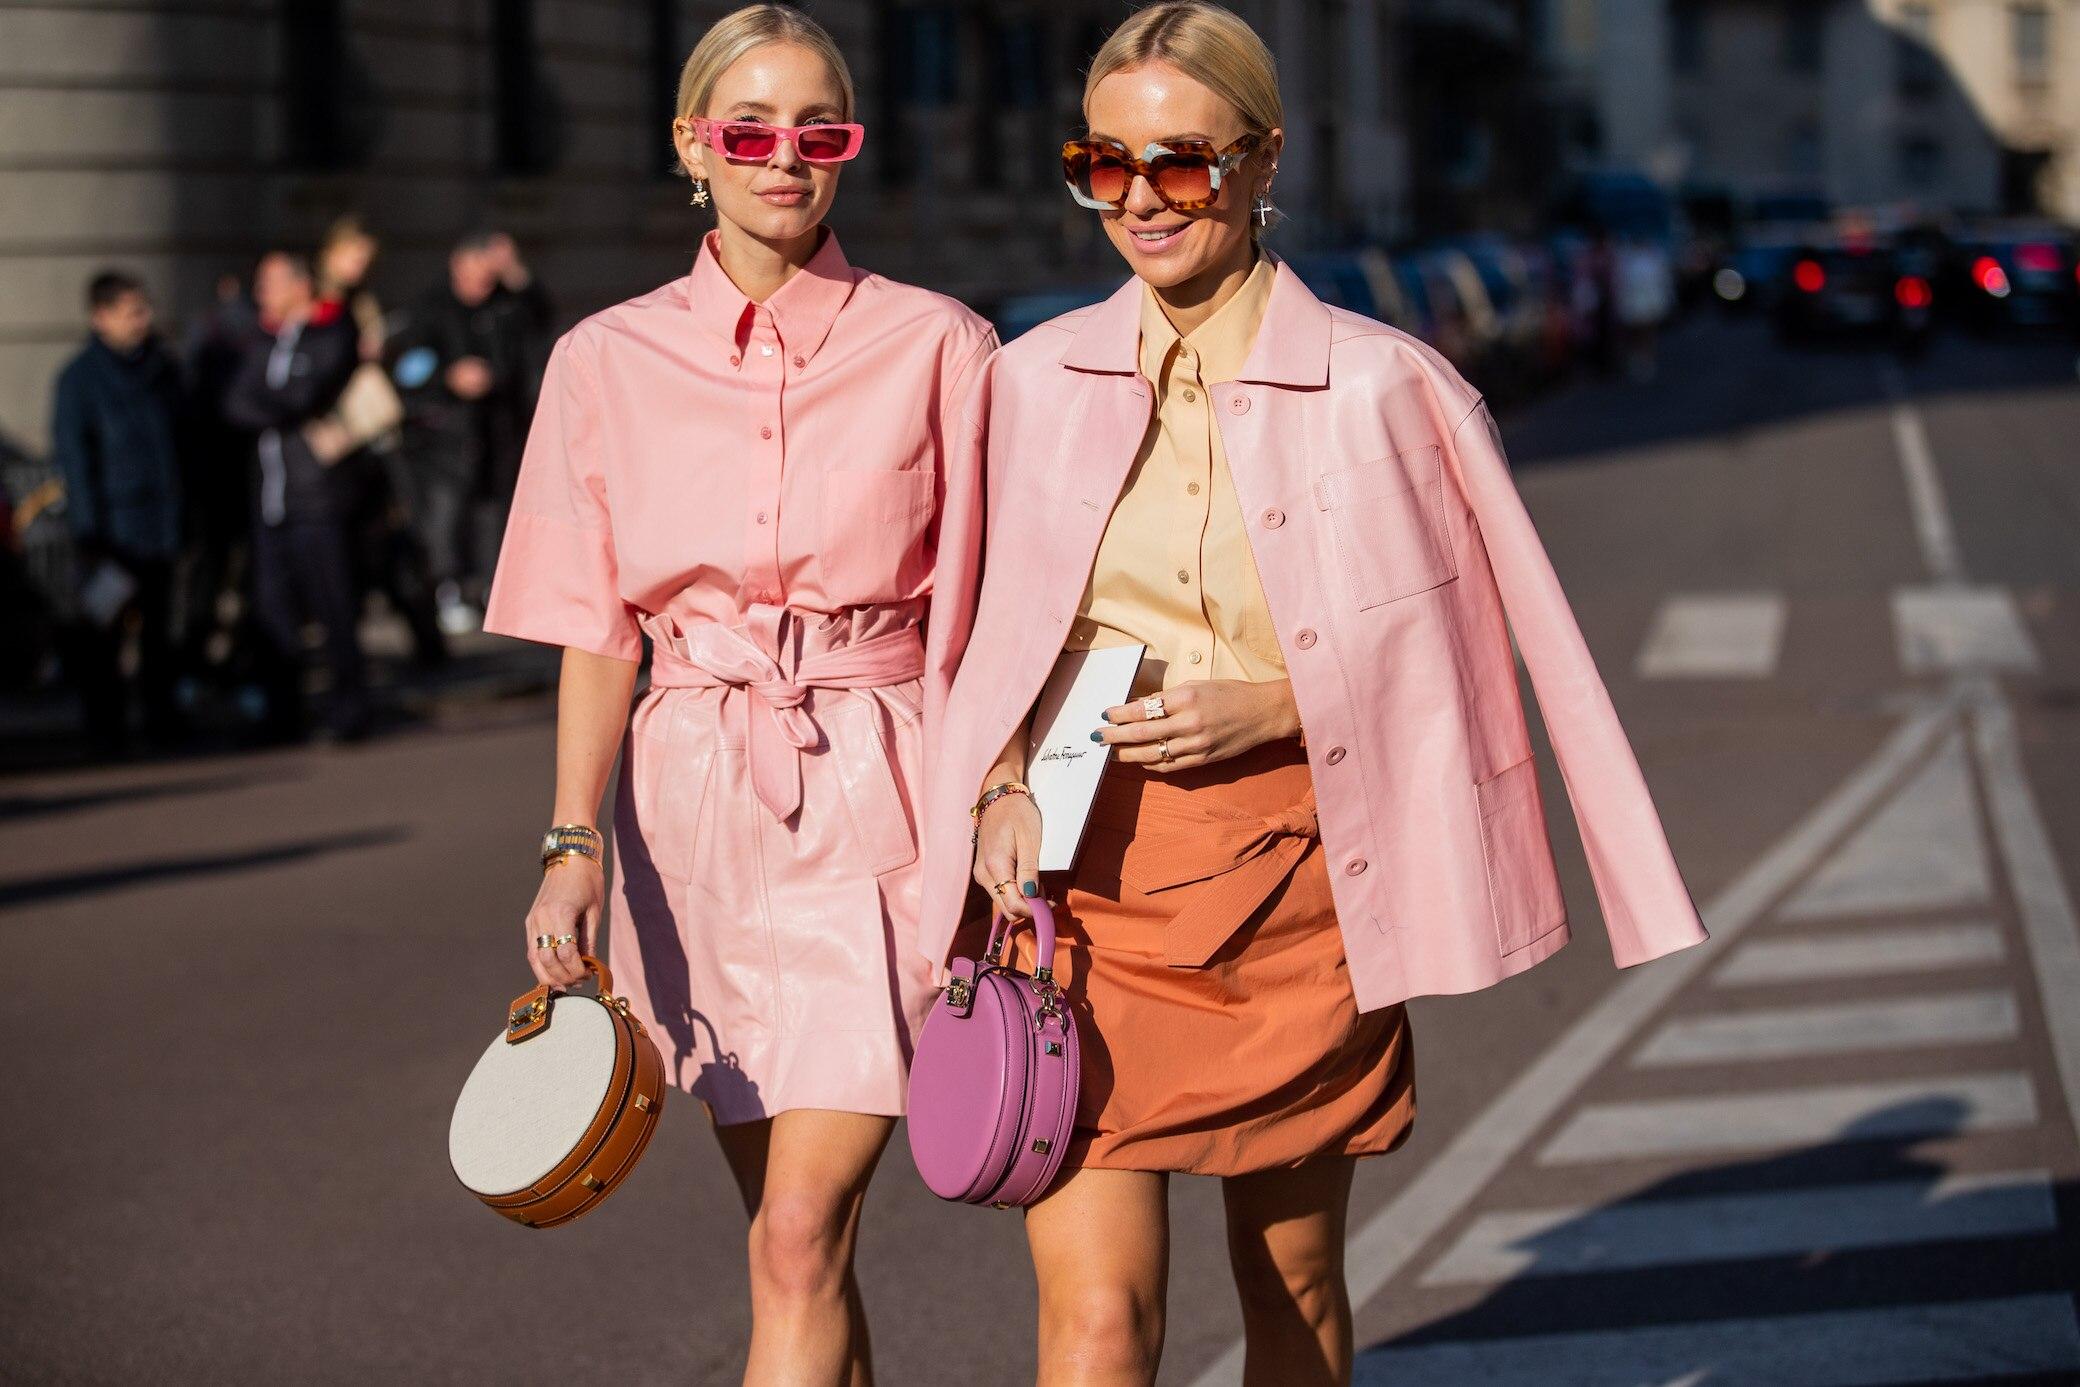 Zwei Frauen in rosa Outfits